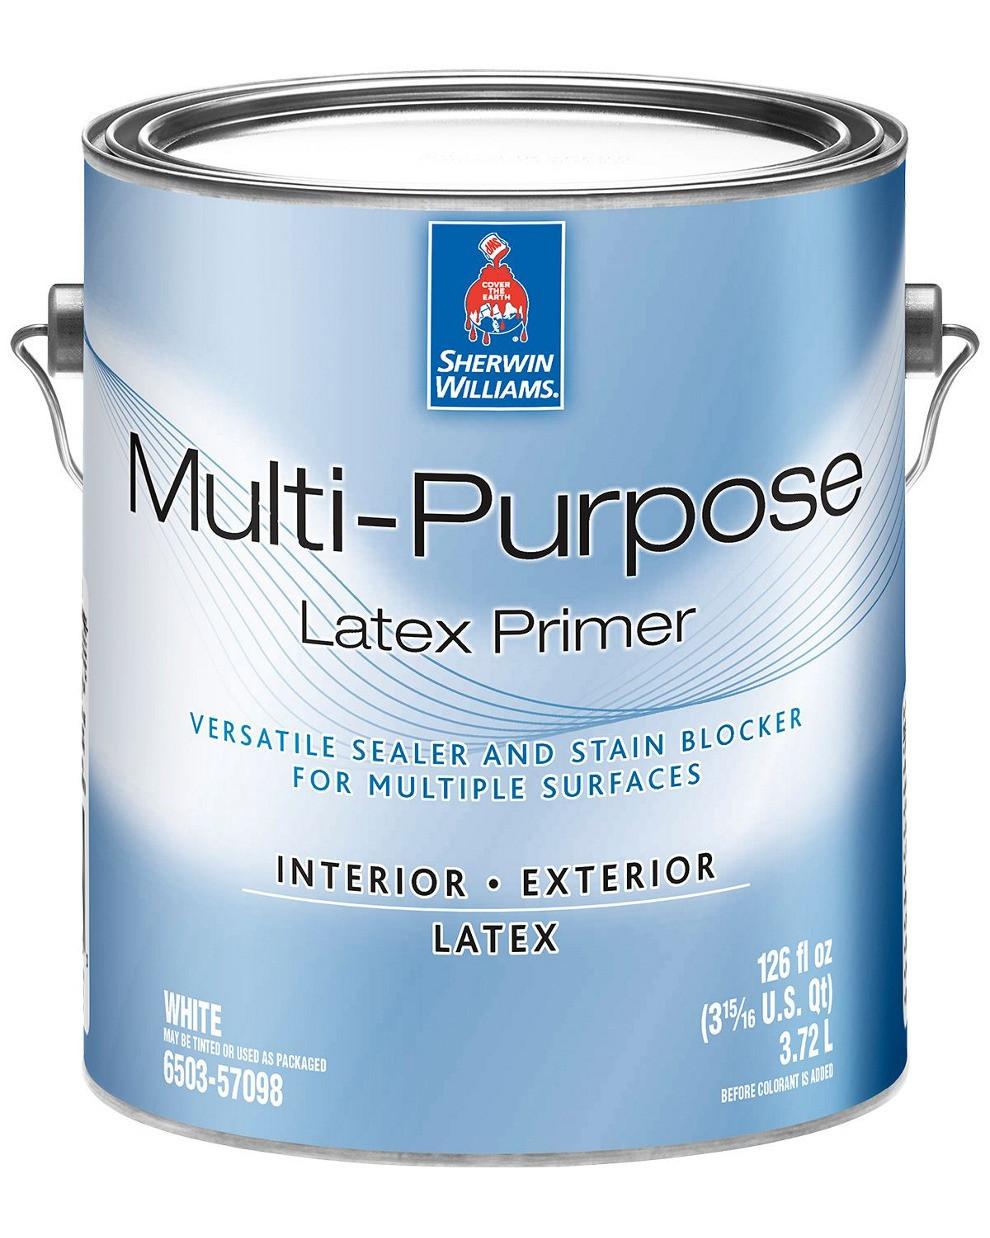 Грунтовка Multi-Purpose Latex Primer Sherwin-Williams белая, 3,72л (грунт мульти пурпоз шервин вильямс)